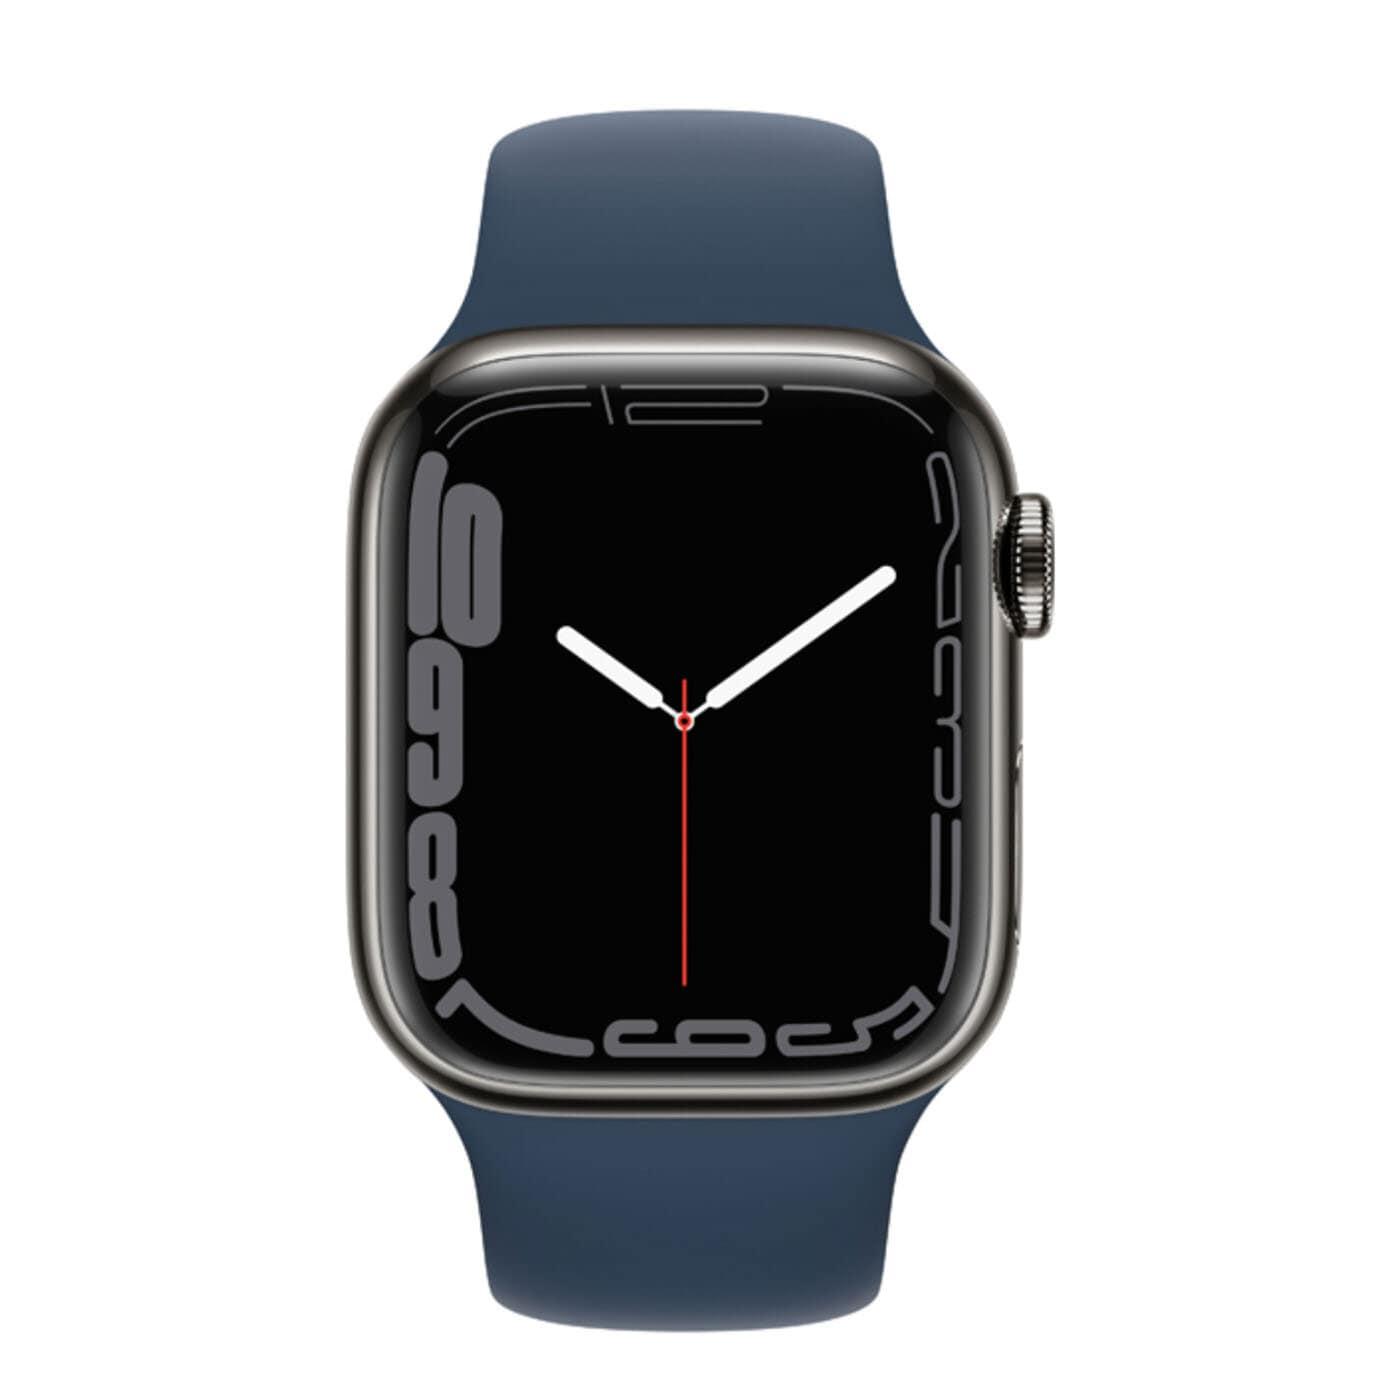 Apple Watch Series 7 Rostfri stålboett med Sportband - Grafit